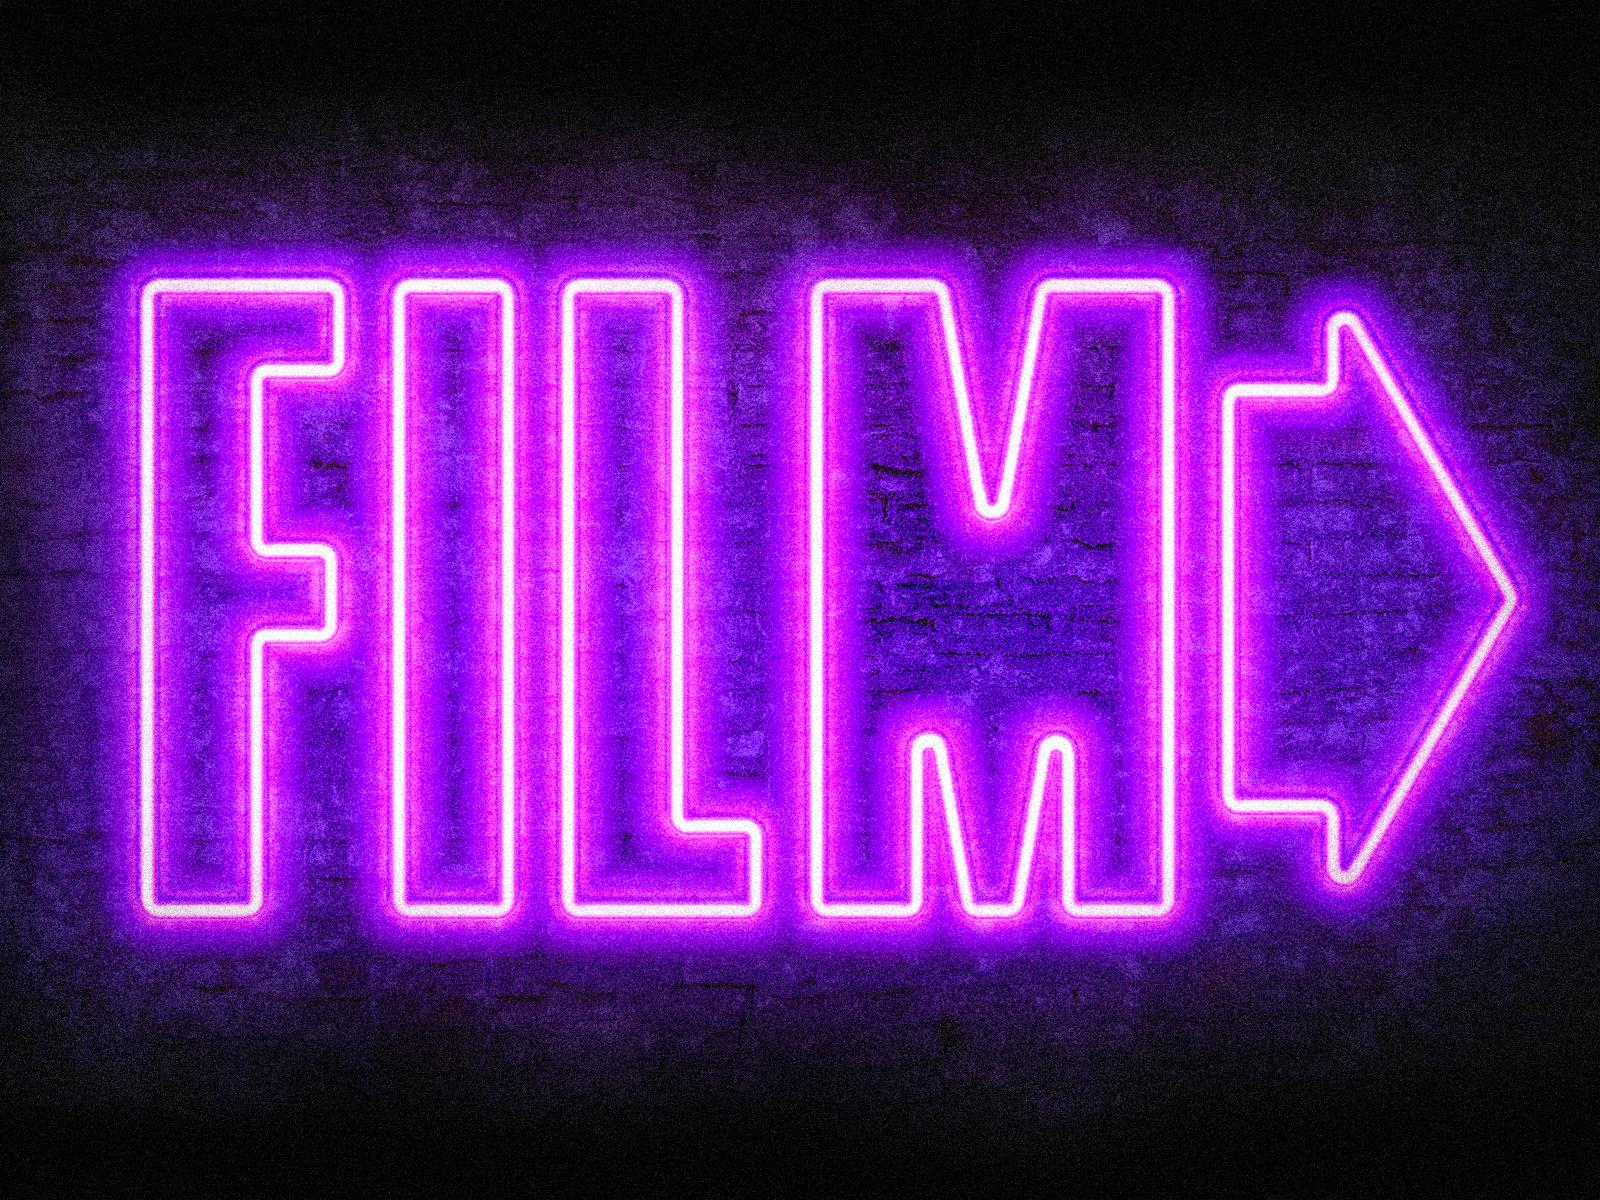 Film neonsign large